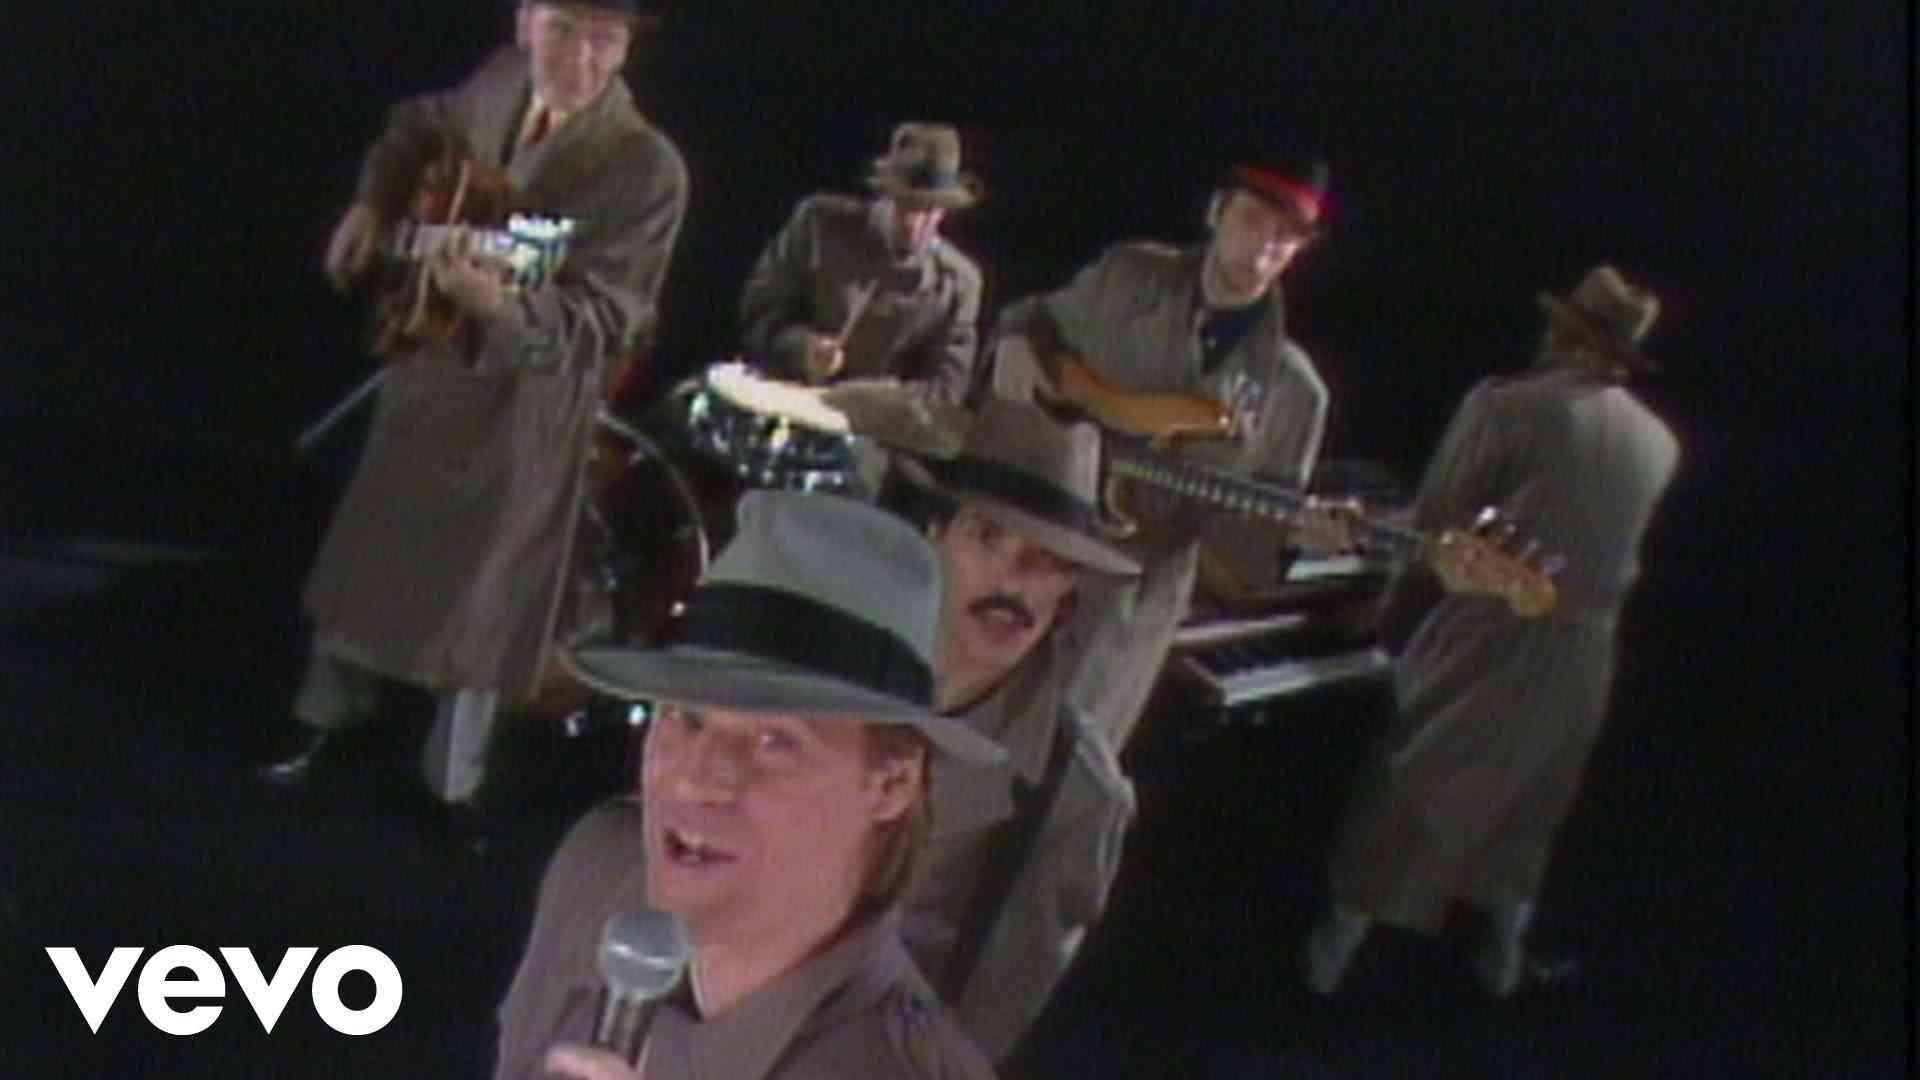 Daryl Hall & John Oates - Private Eyes - YouTube